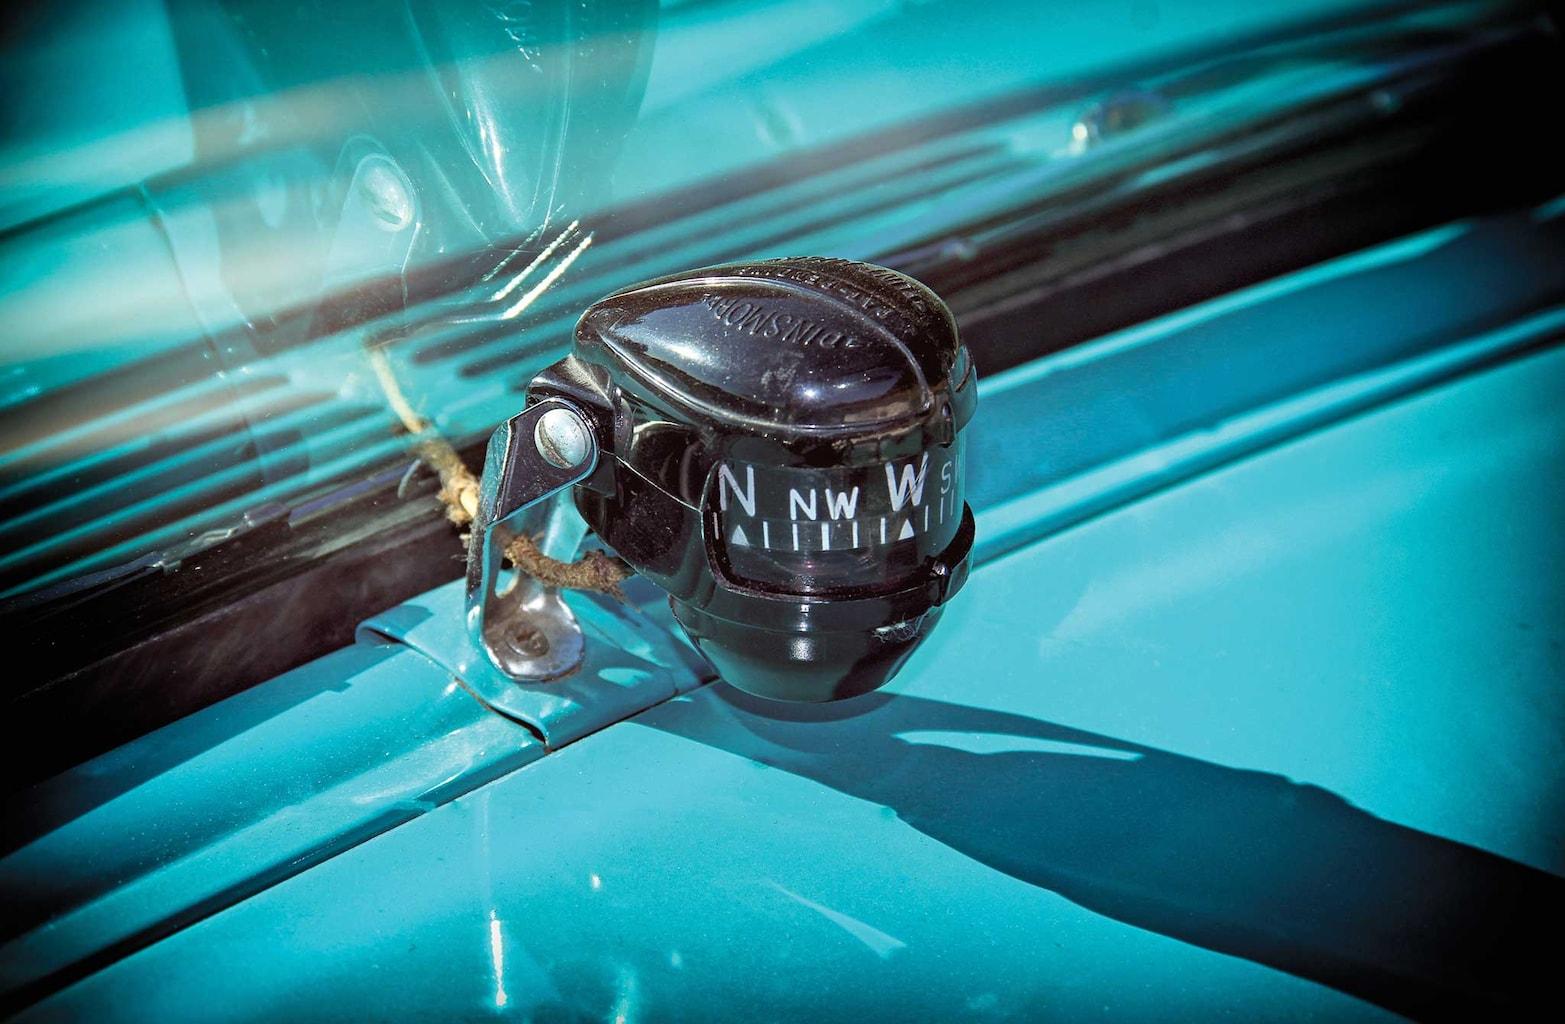 1955 chevy bel air convertible dash compass 003